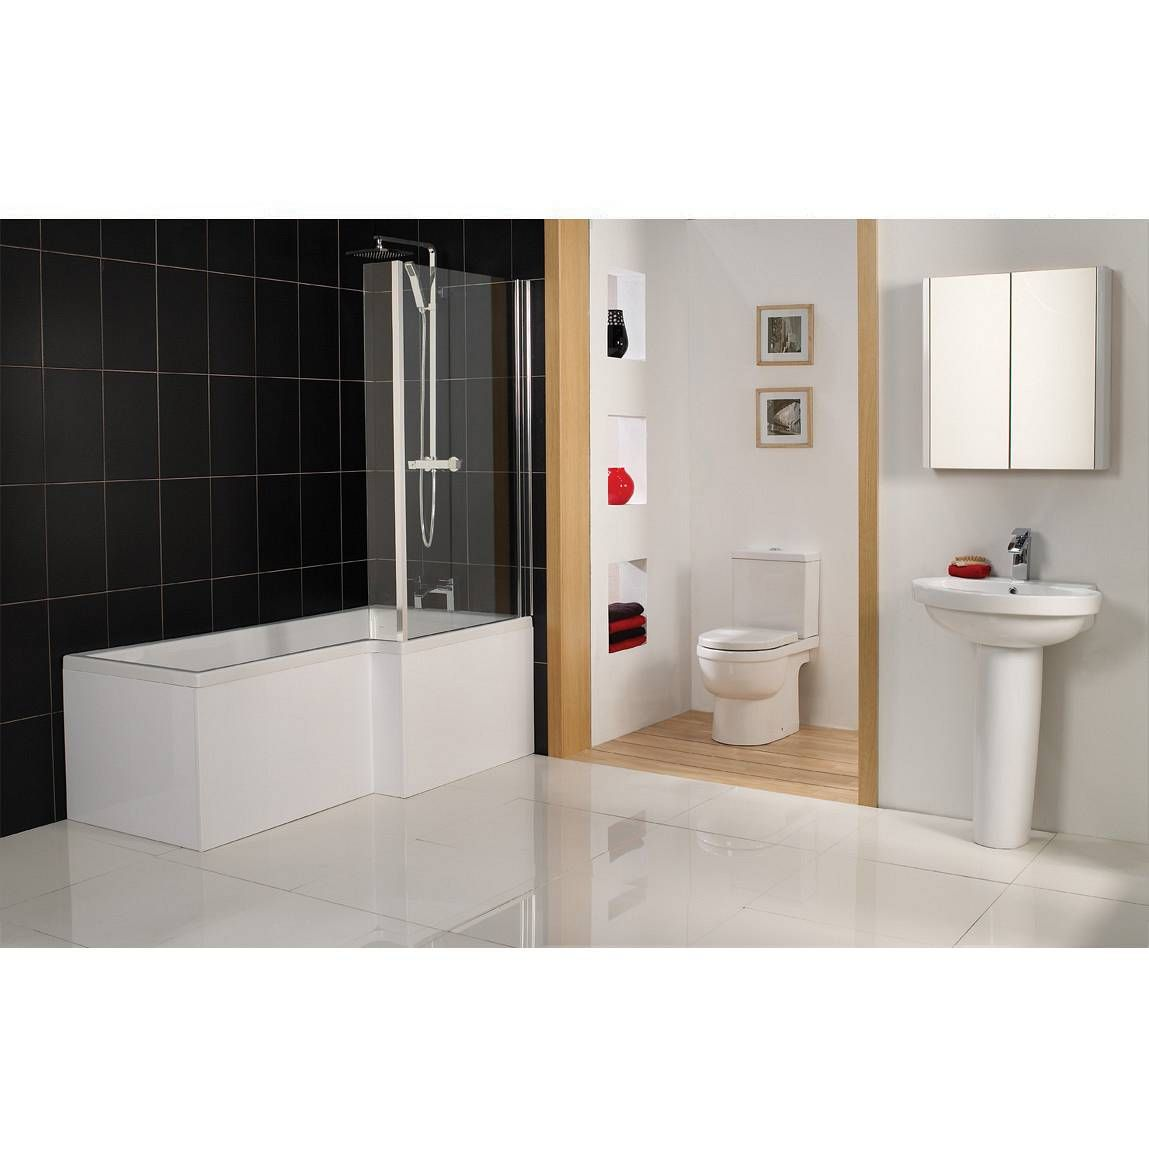 Cambridge Square Shower Bath RH & Screen | For the Home | Pinterest ...